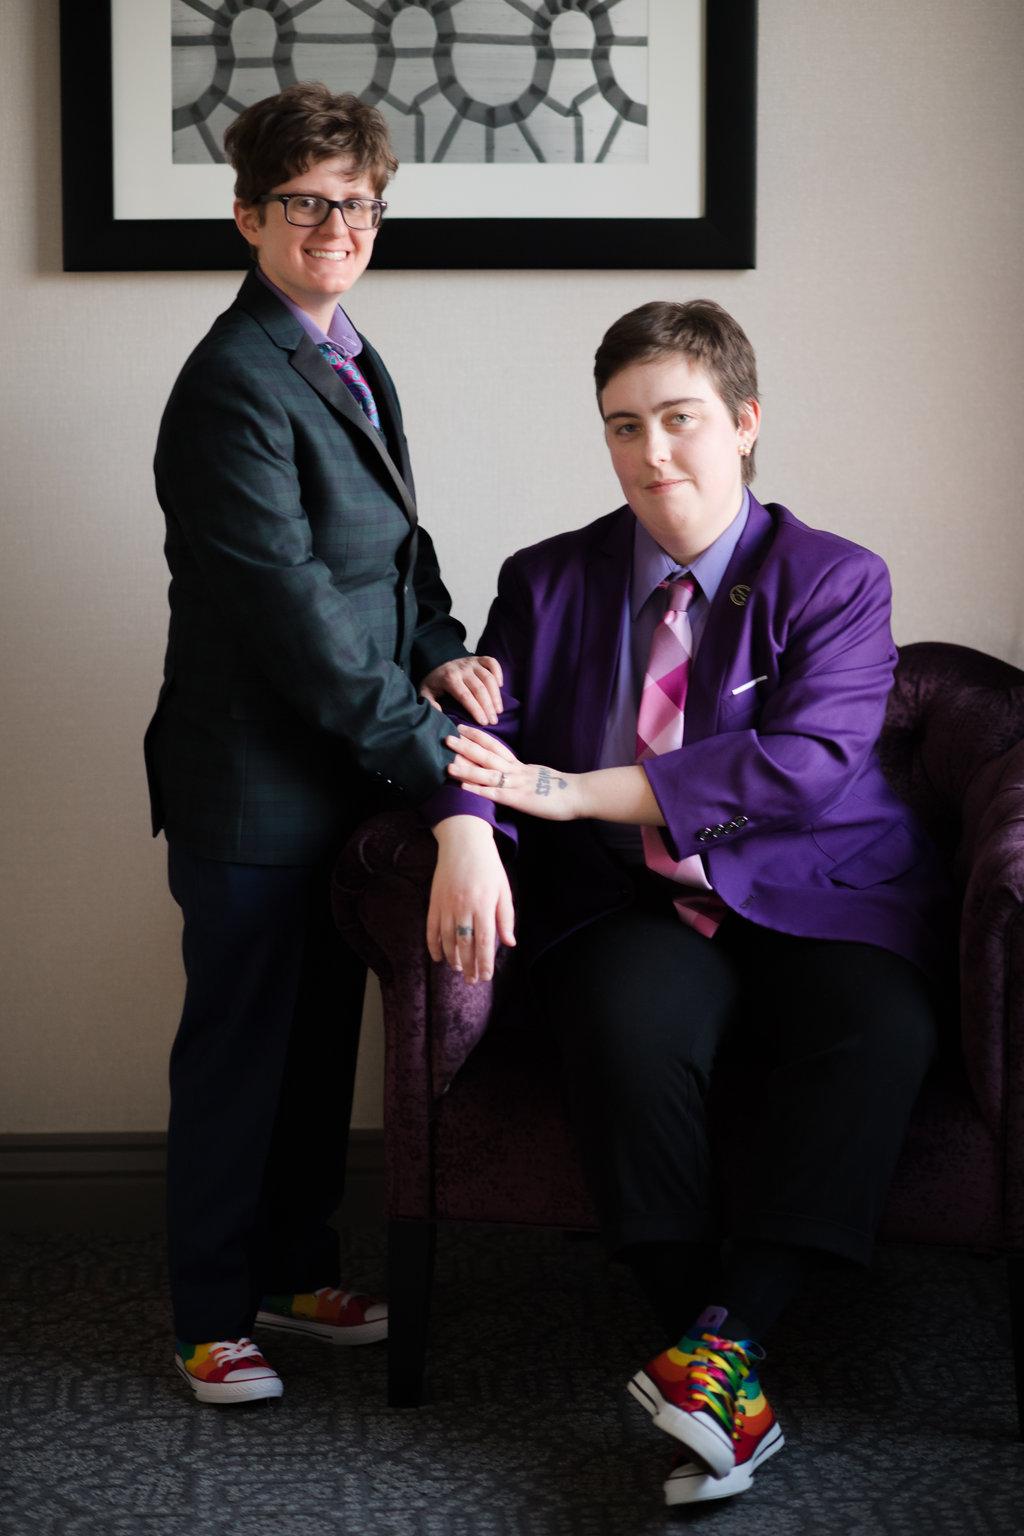 Non Binary couple on the wedding celebration day